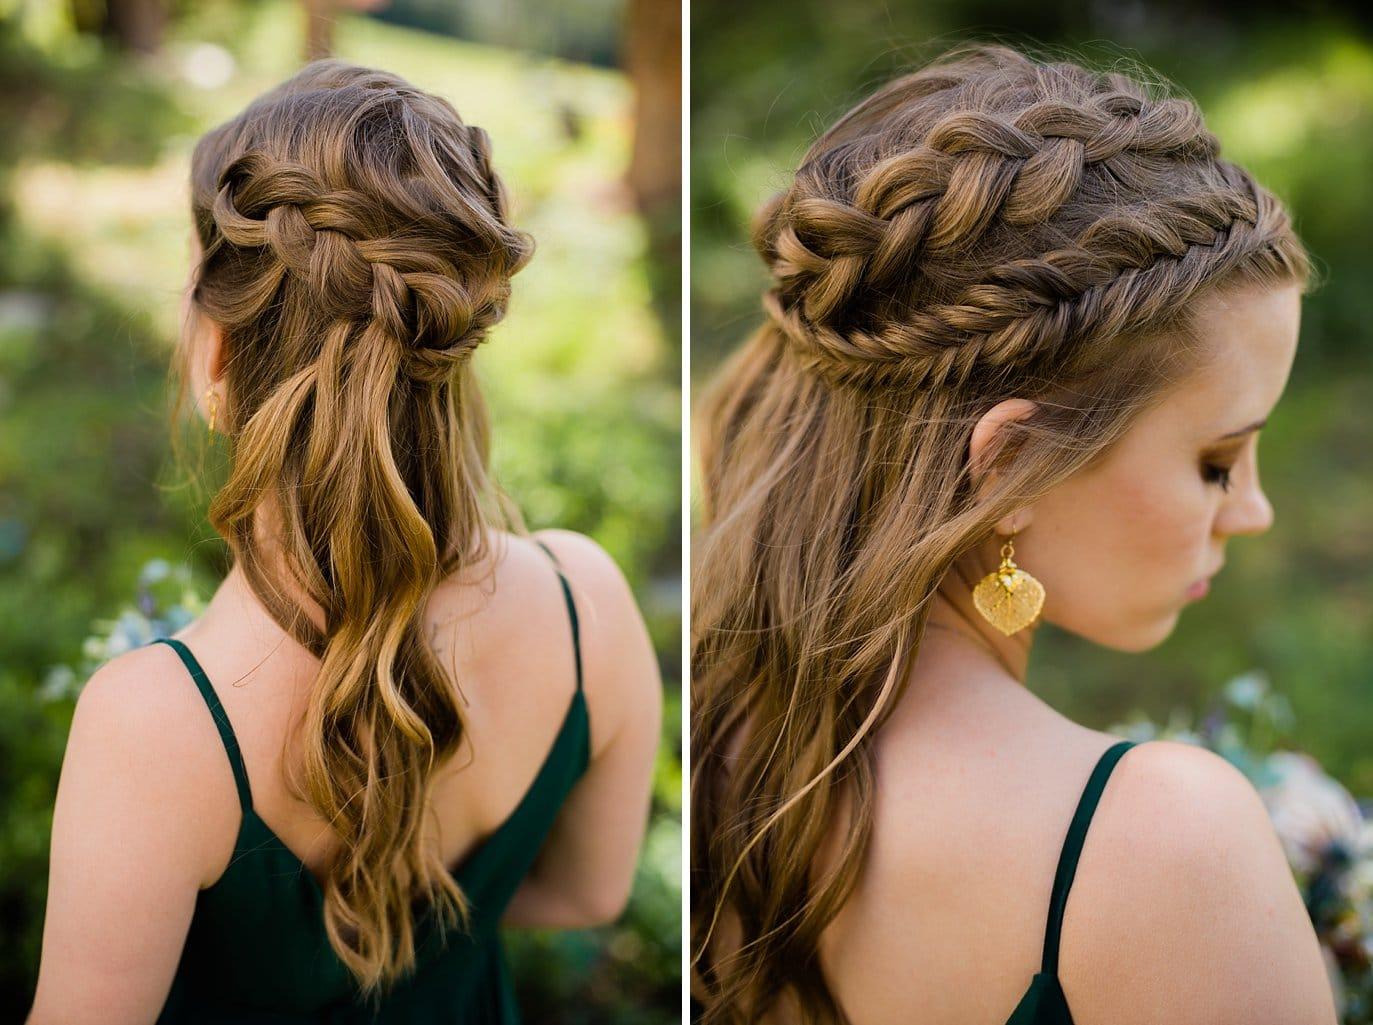 braided half up half down wedding hair at Arapahoe Basin wedding by Arapahoe Basin wedding photographer Jennie Crate photographer